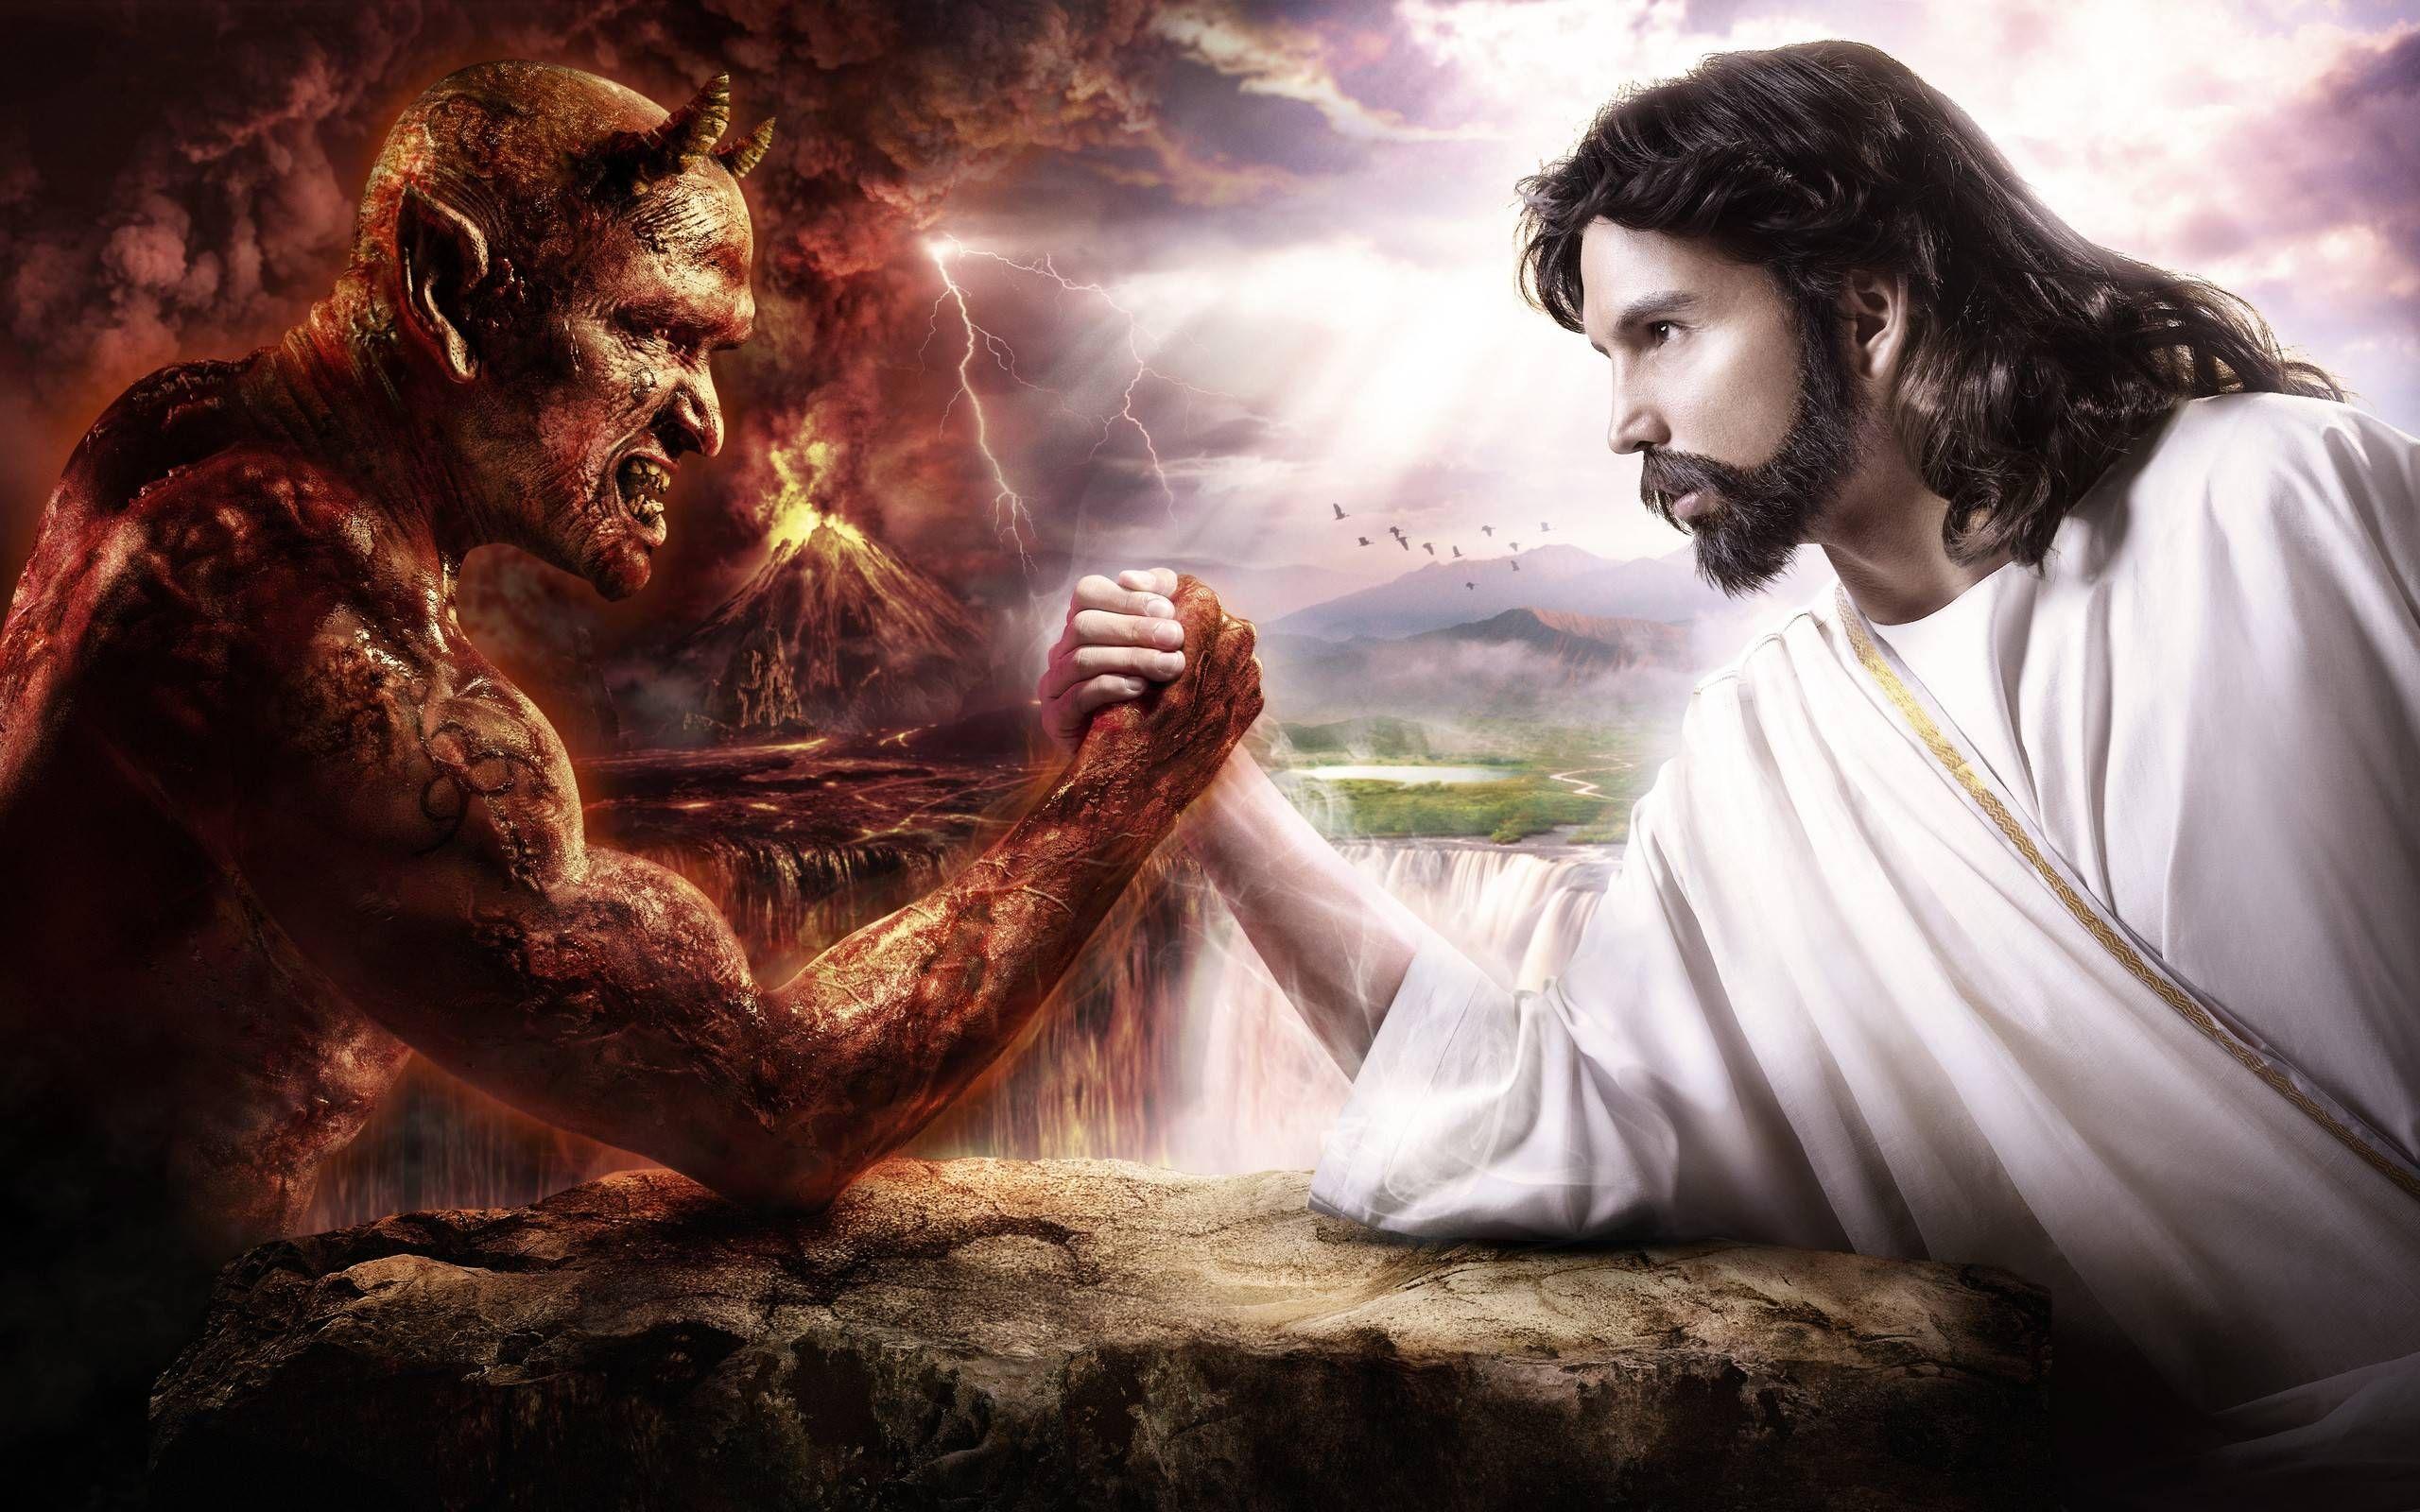 Jesus Wallpaper Hd Wallpapers Backgrounds Of Your Choice Jesus Wallpaper Jesus Satan